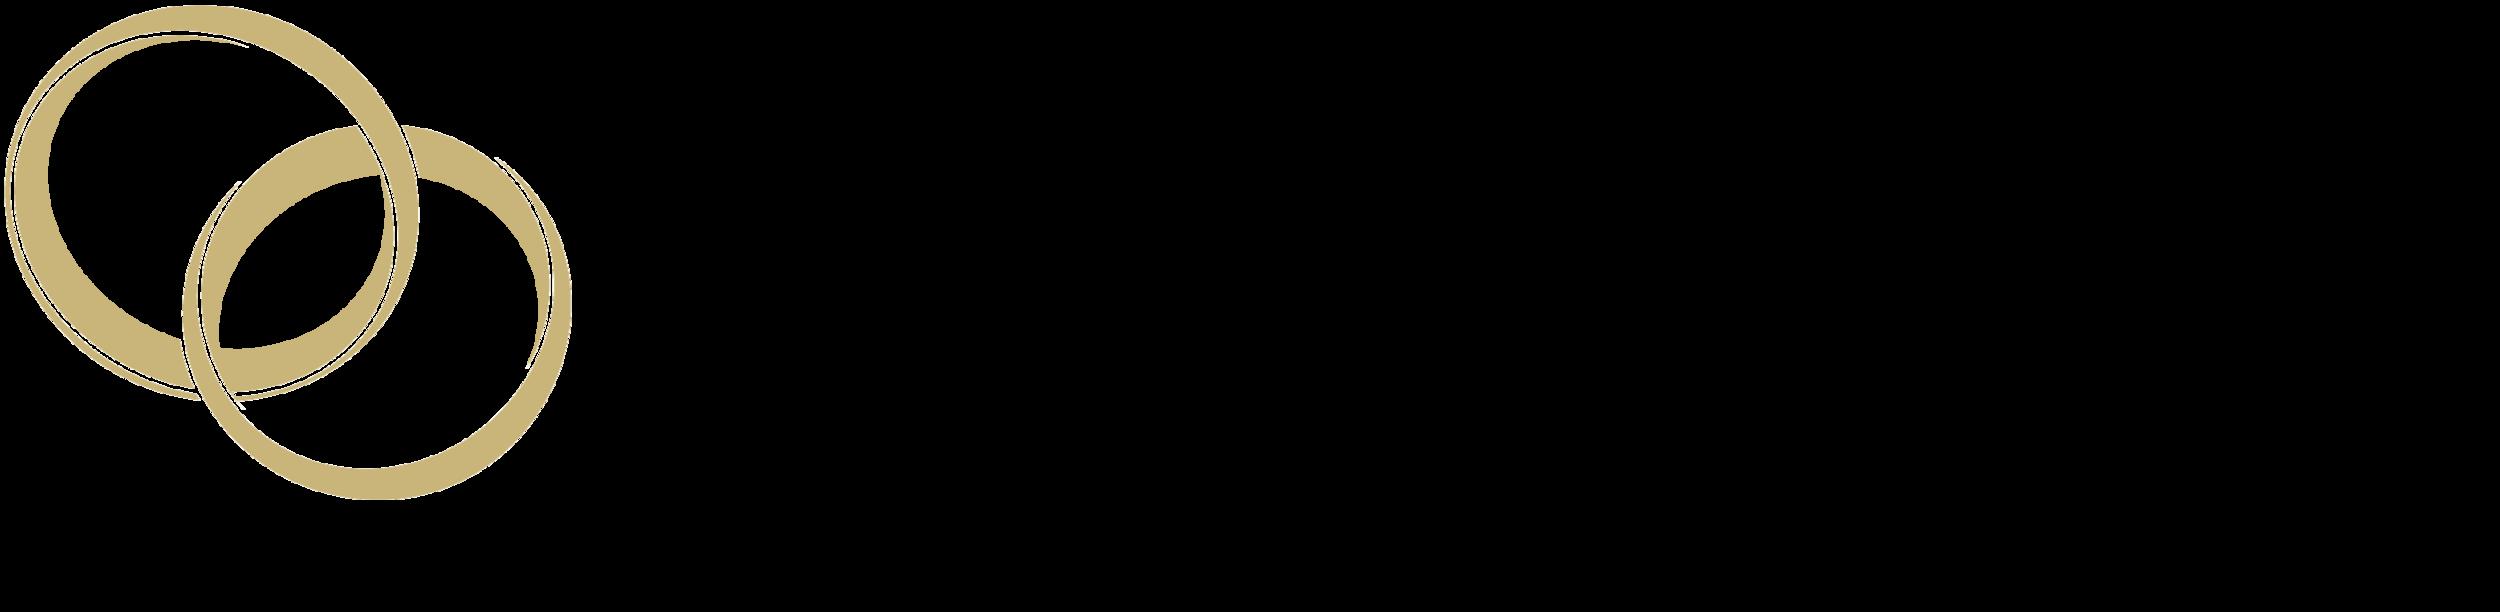 HigherRing2.0_logo#C7BA7F (2).png